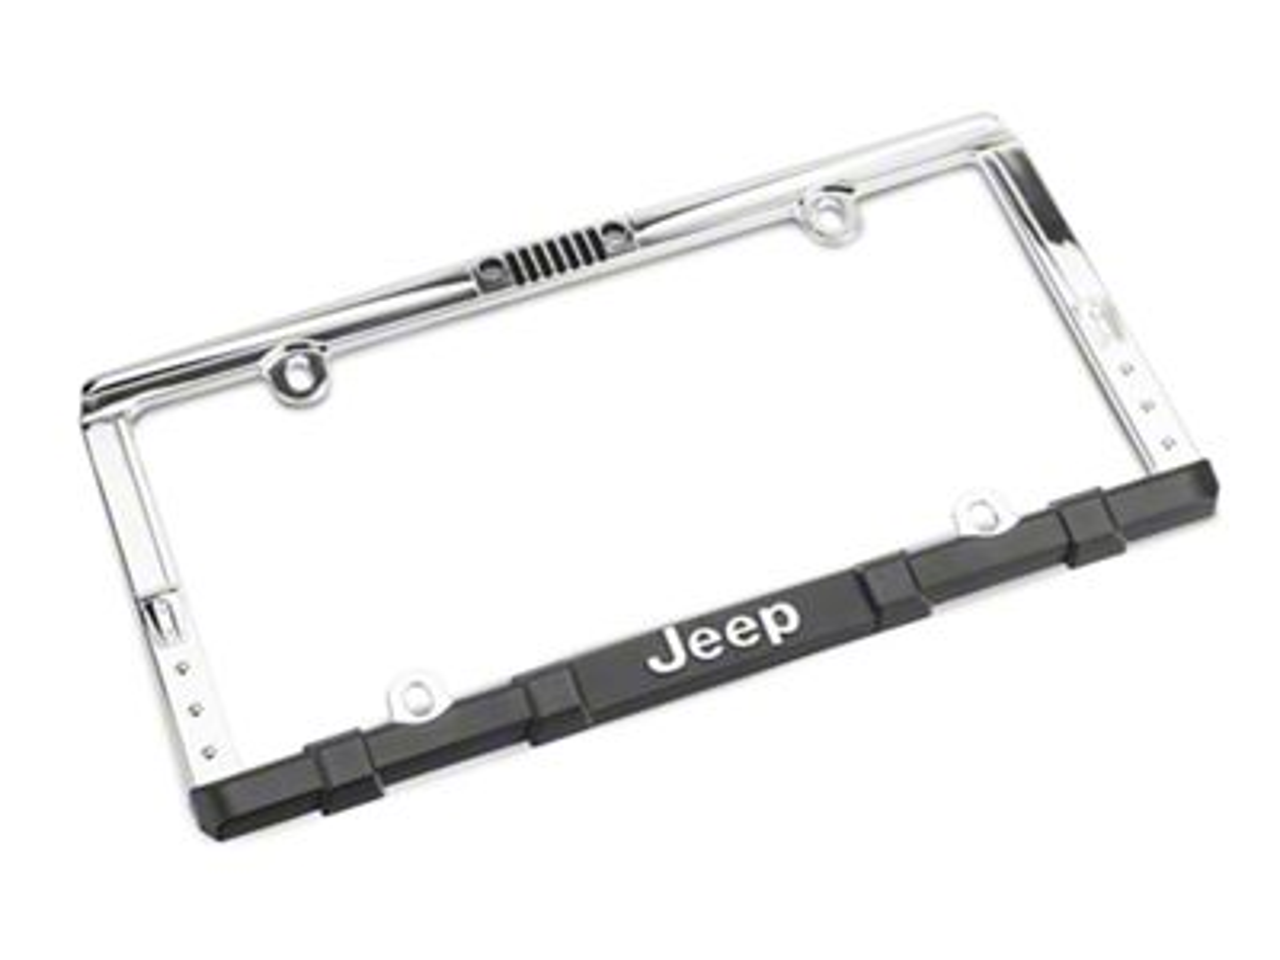 Chroma Jeep Wrangler Grille License Plate Frame w/ Keychain